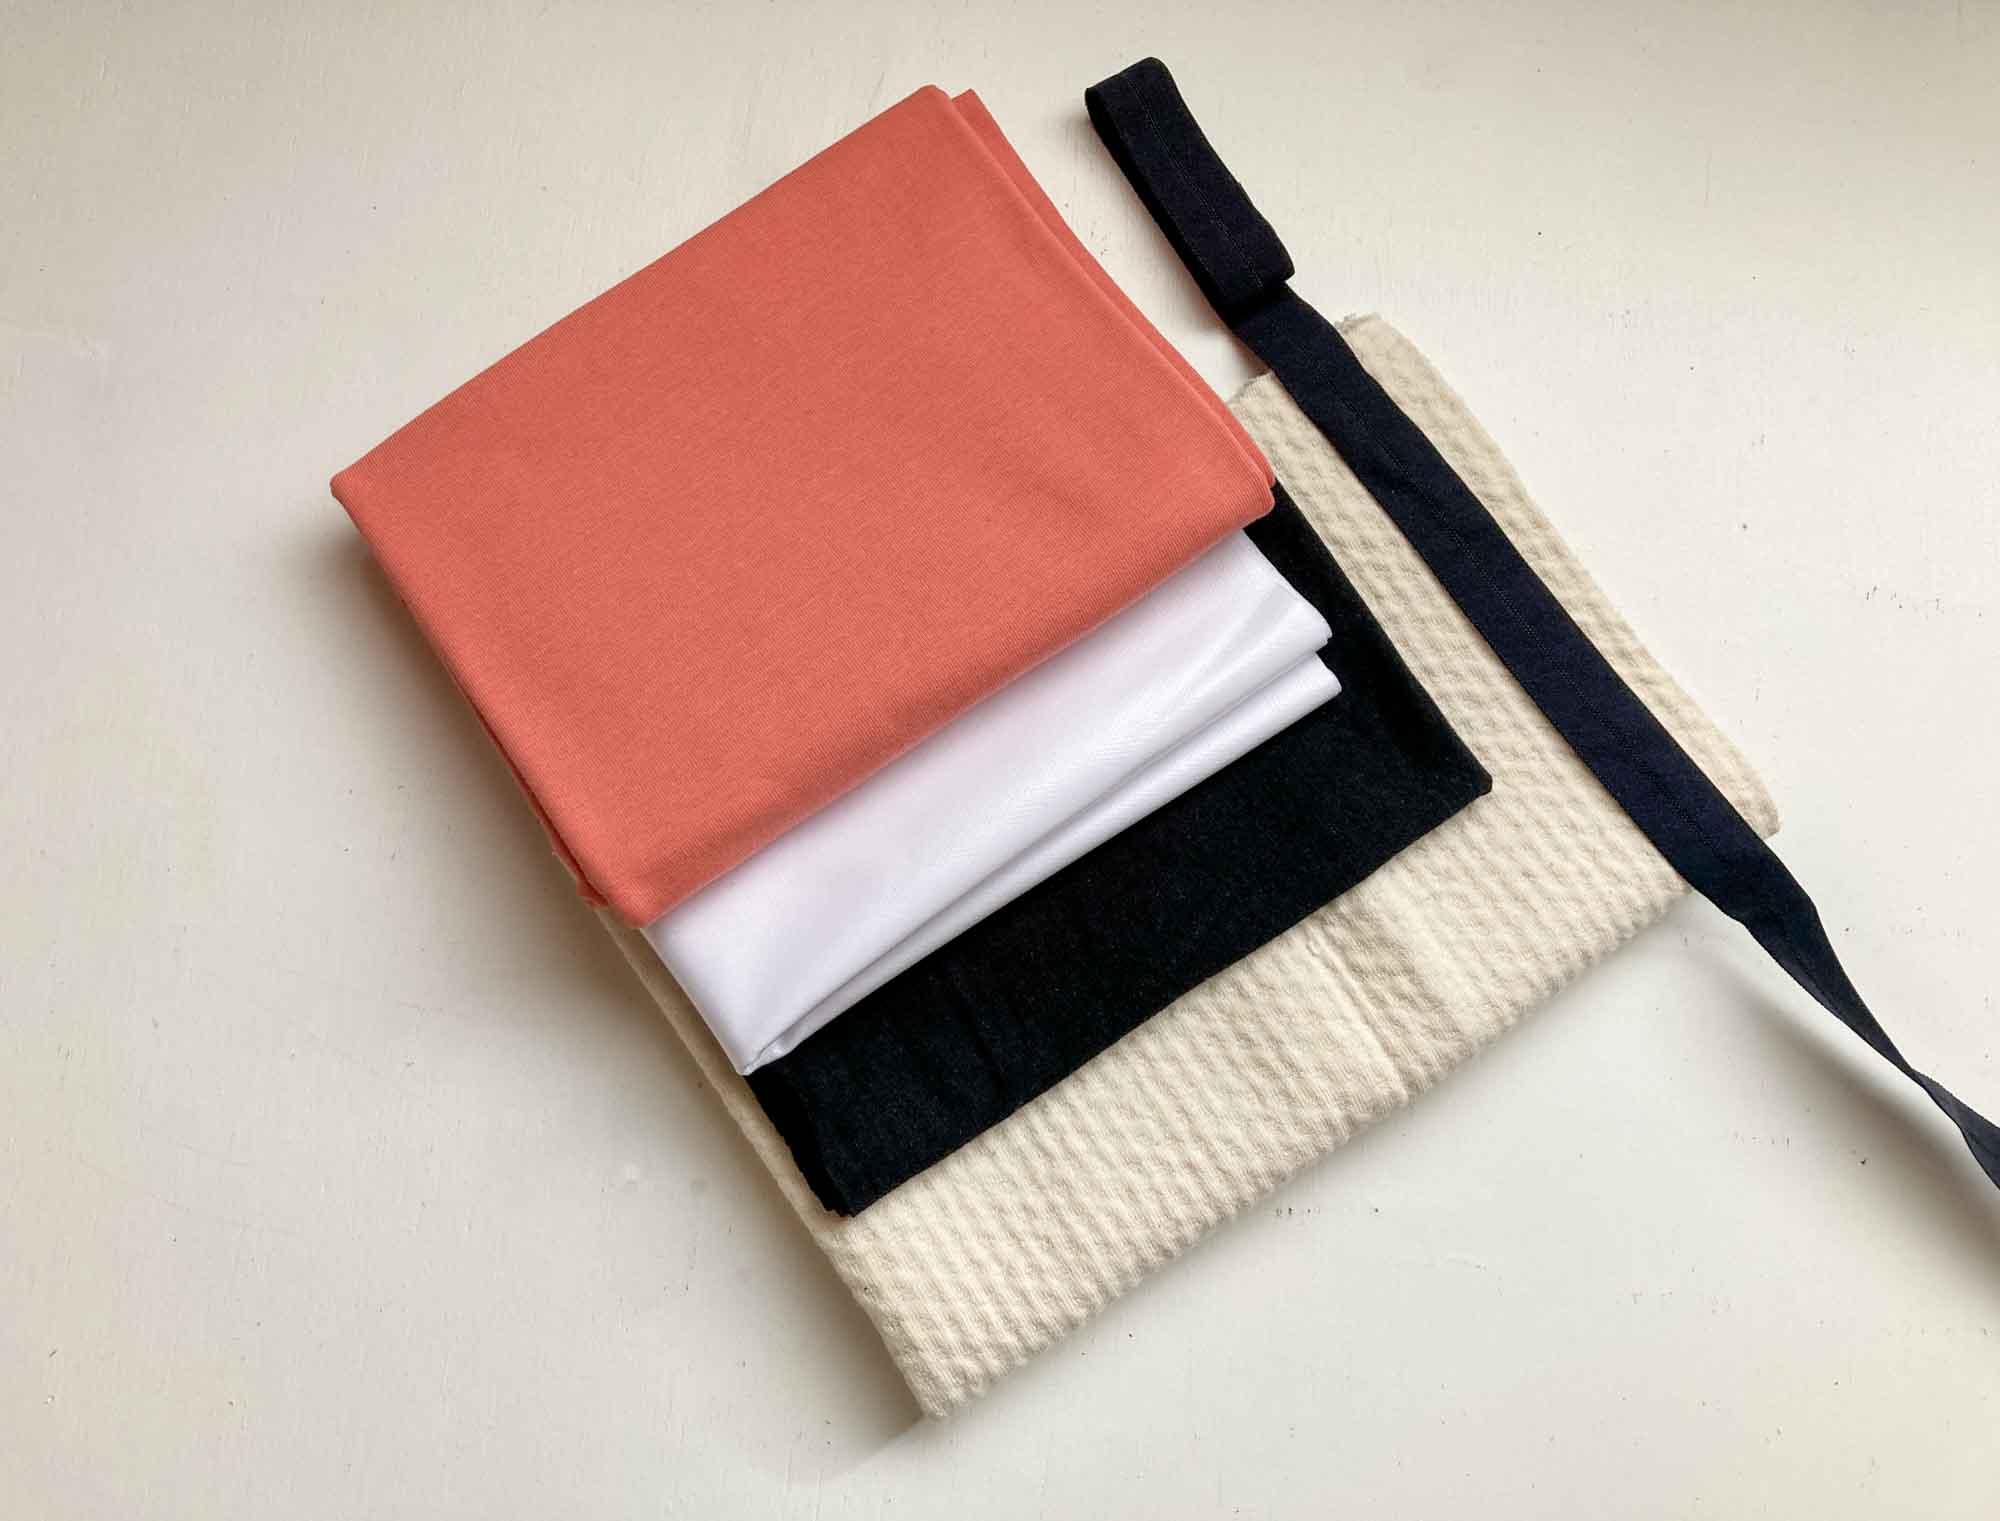 Period Panty Kit Coral